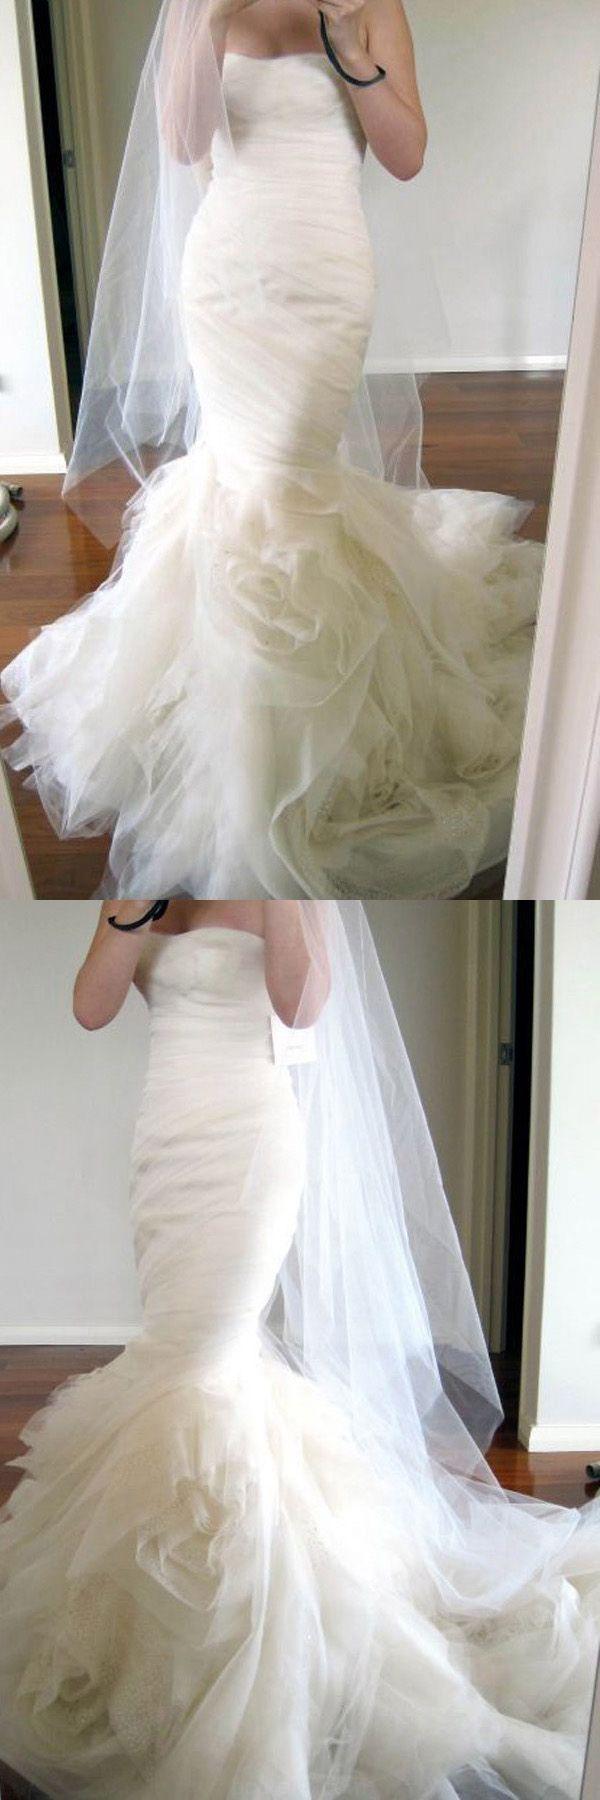 Distinct prom dresses satin wedding dress sweetheart sweep train